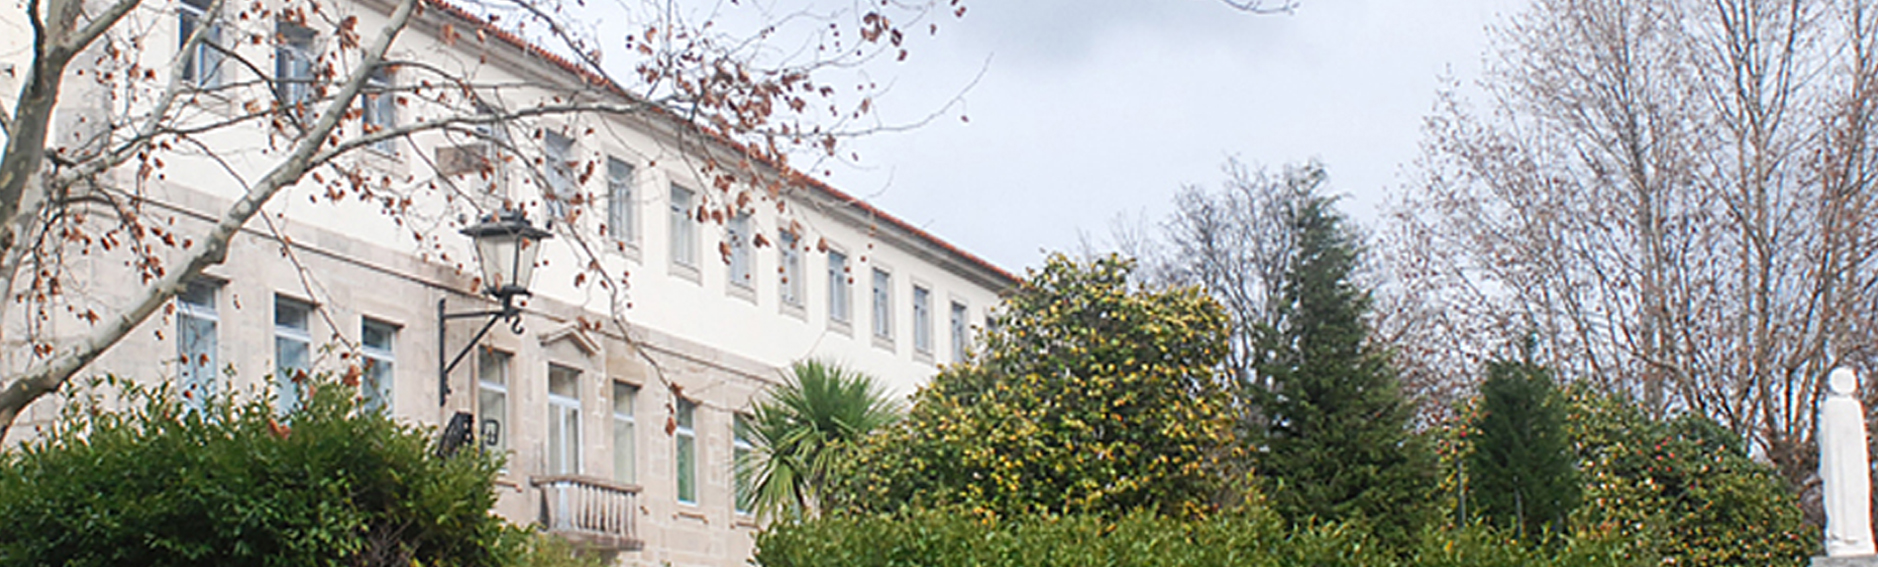 Edifício Colégio de Lamego